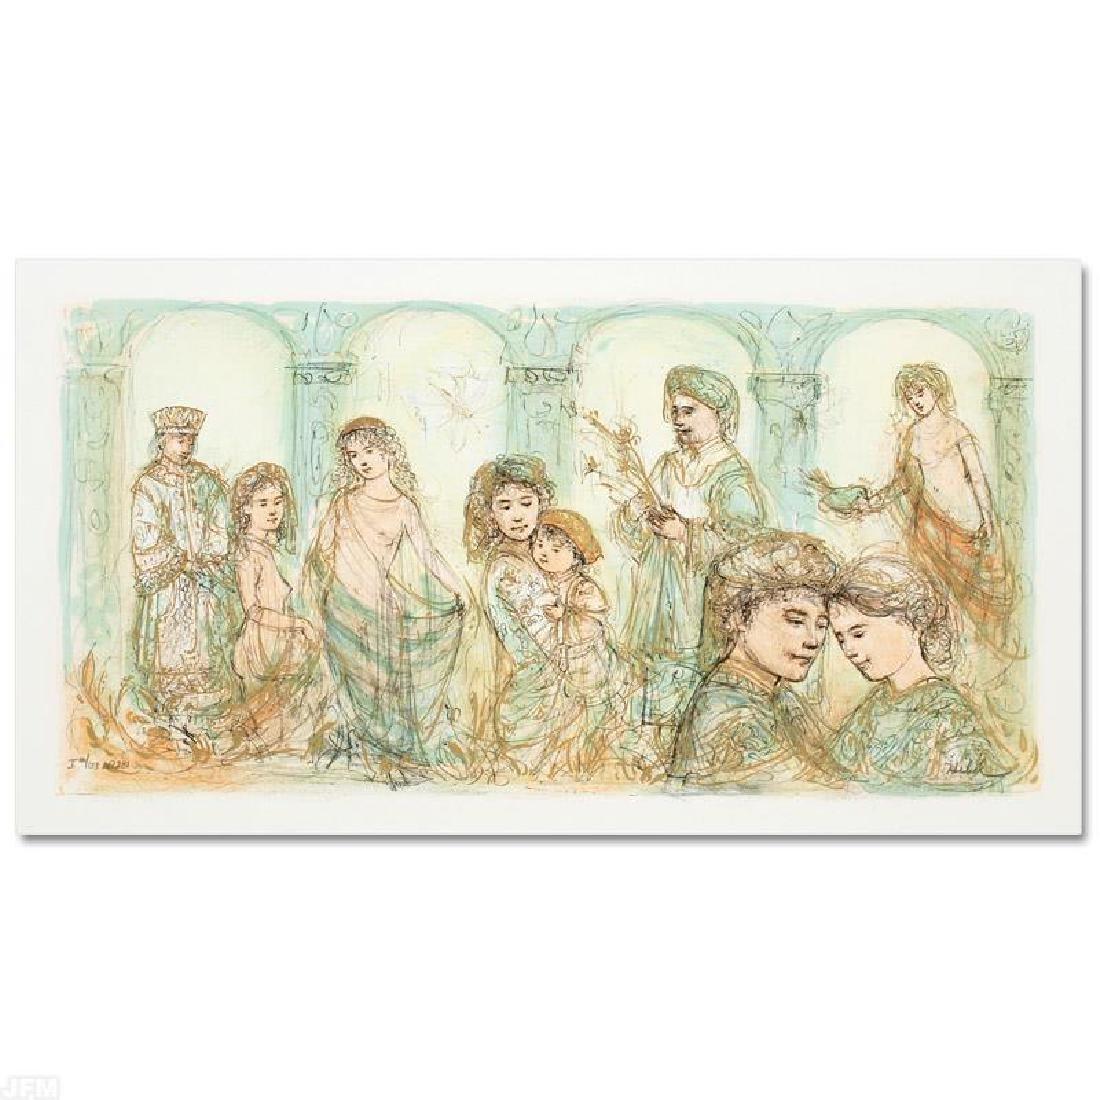 Solomon's Court by Hibel (1917-2014)